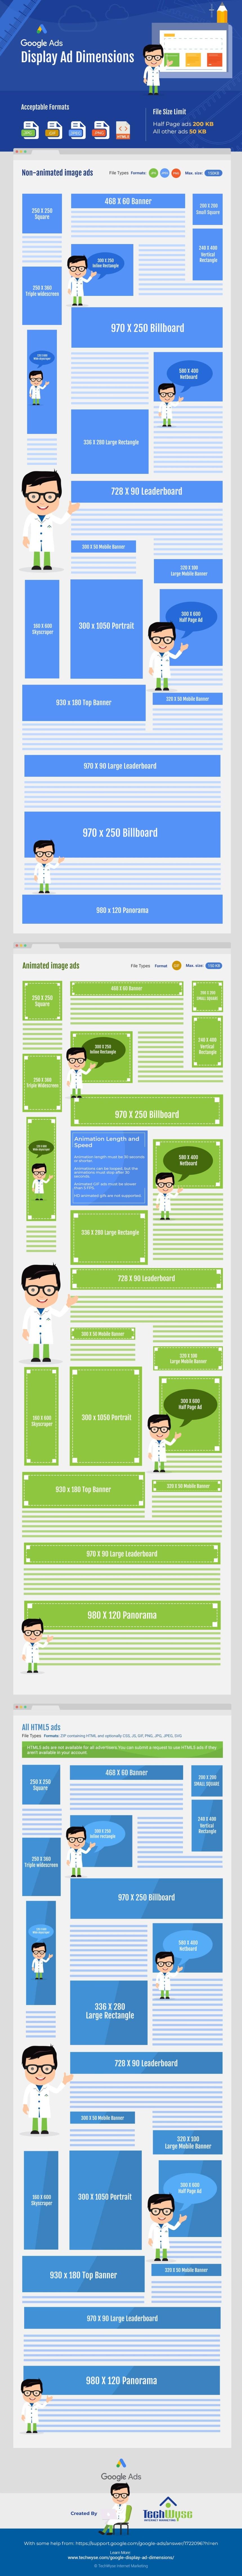 Tamaños de las imágenes para Google Ads #infografia #infographic #marketing